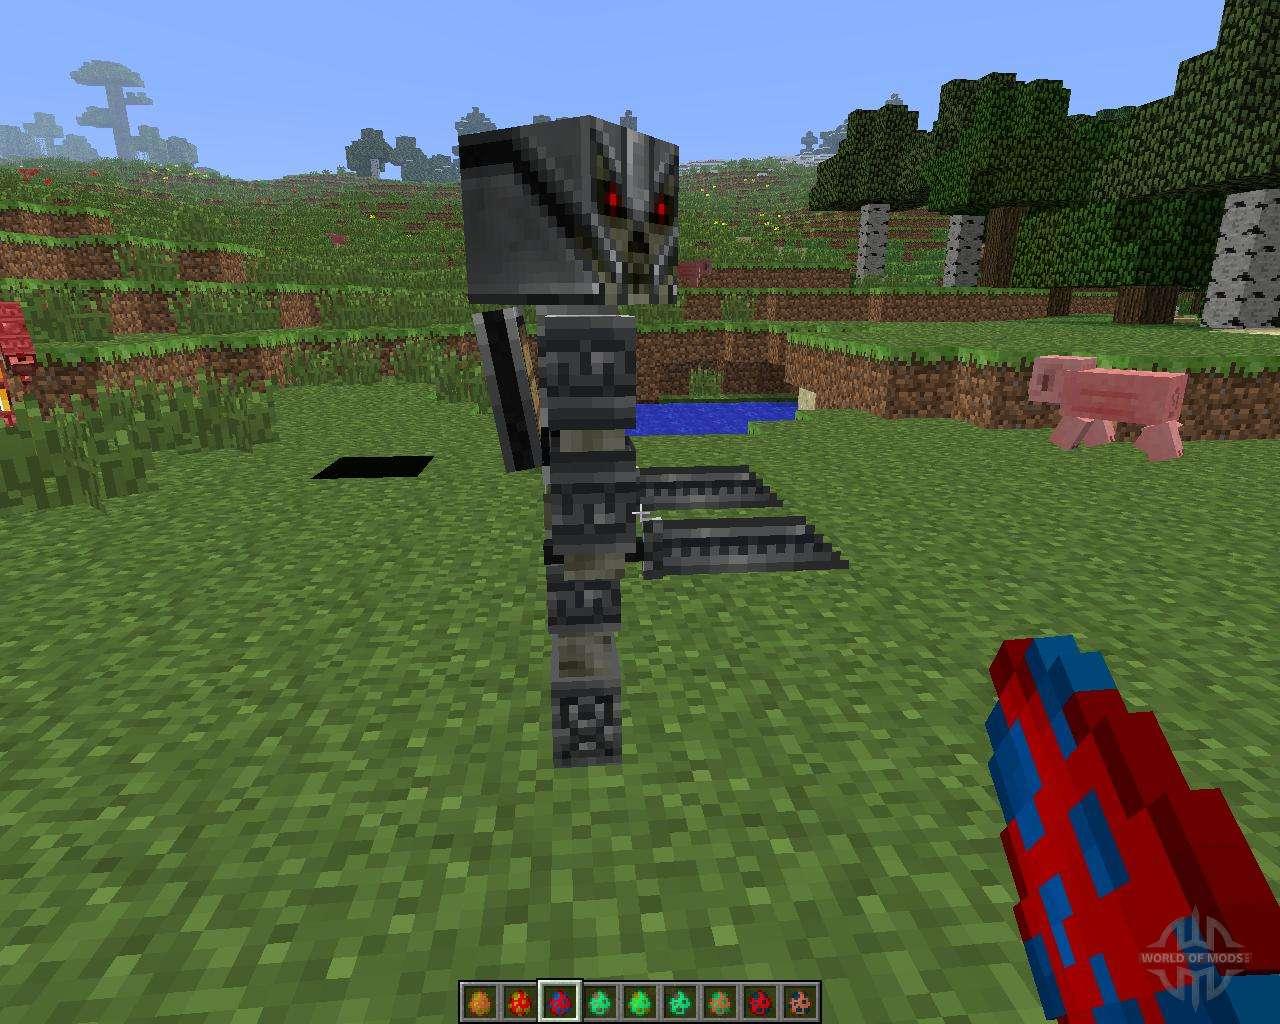 mo minecraft